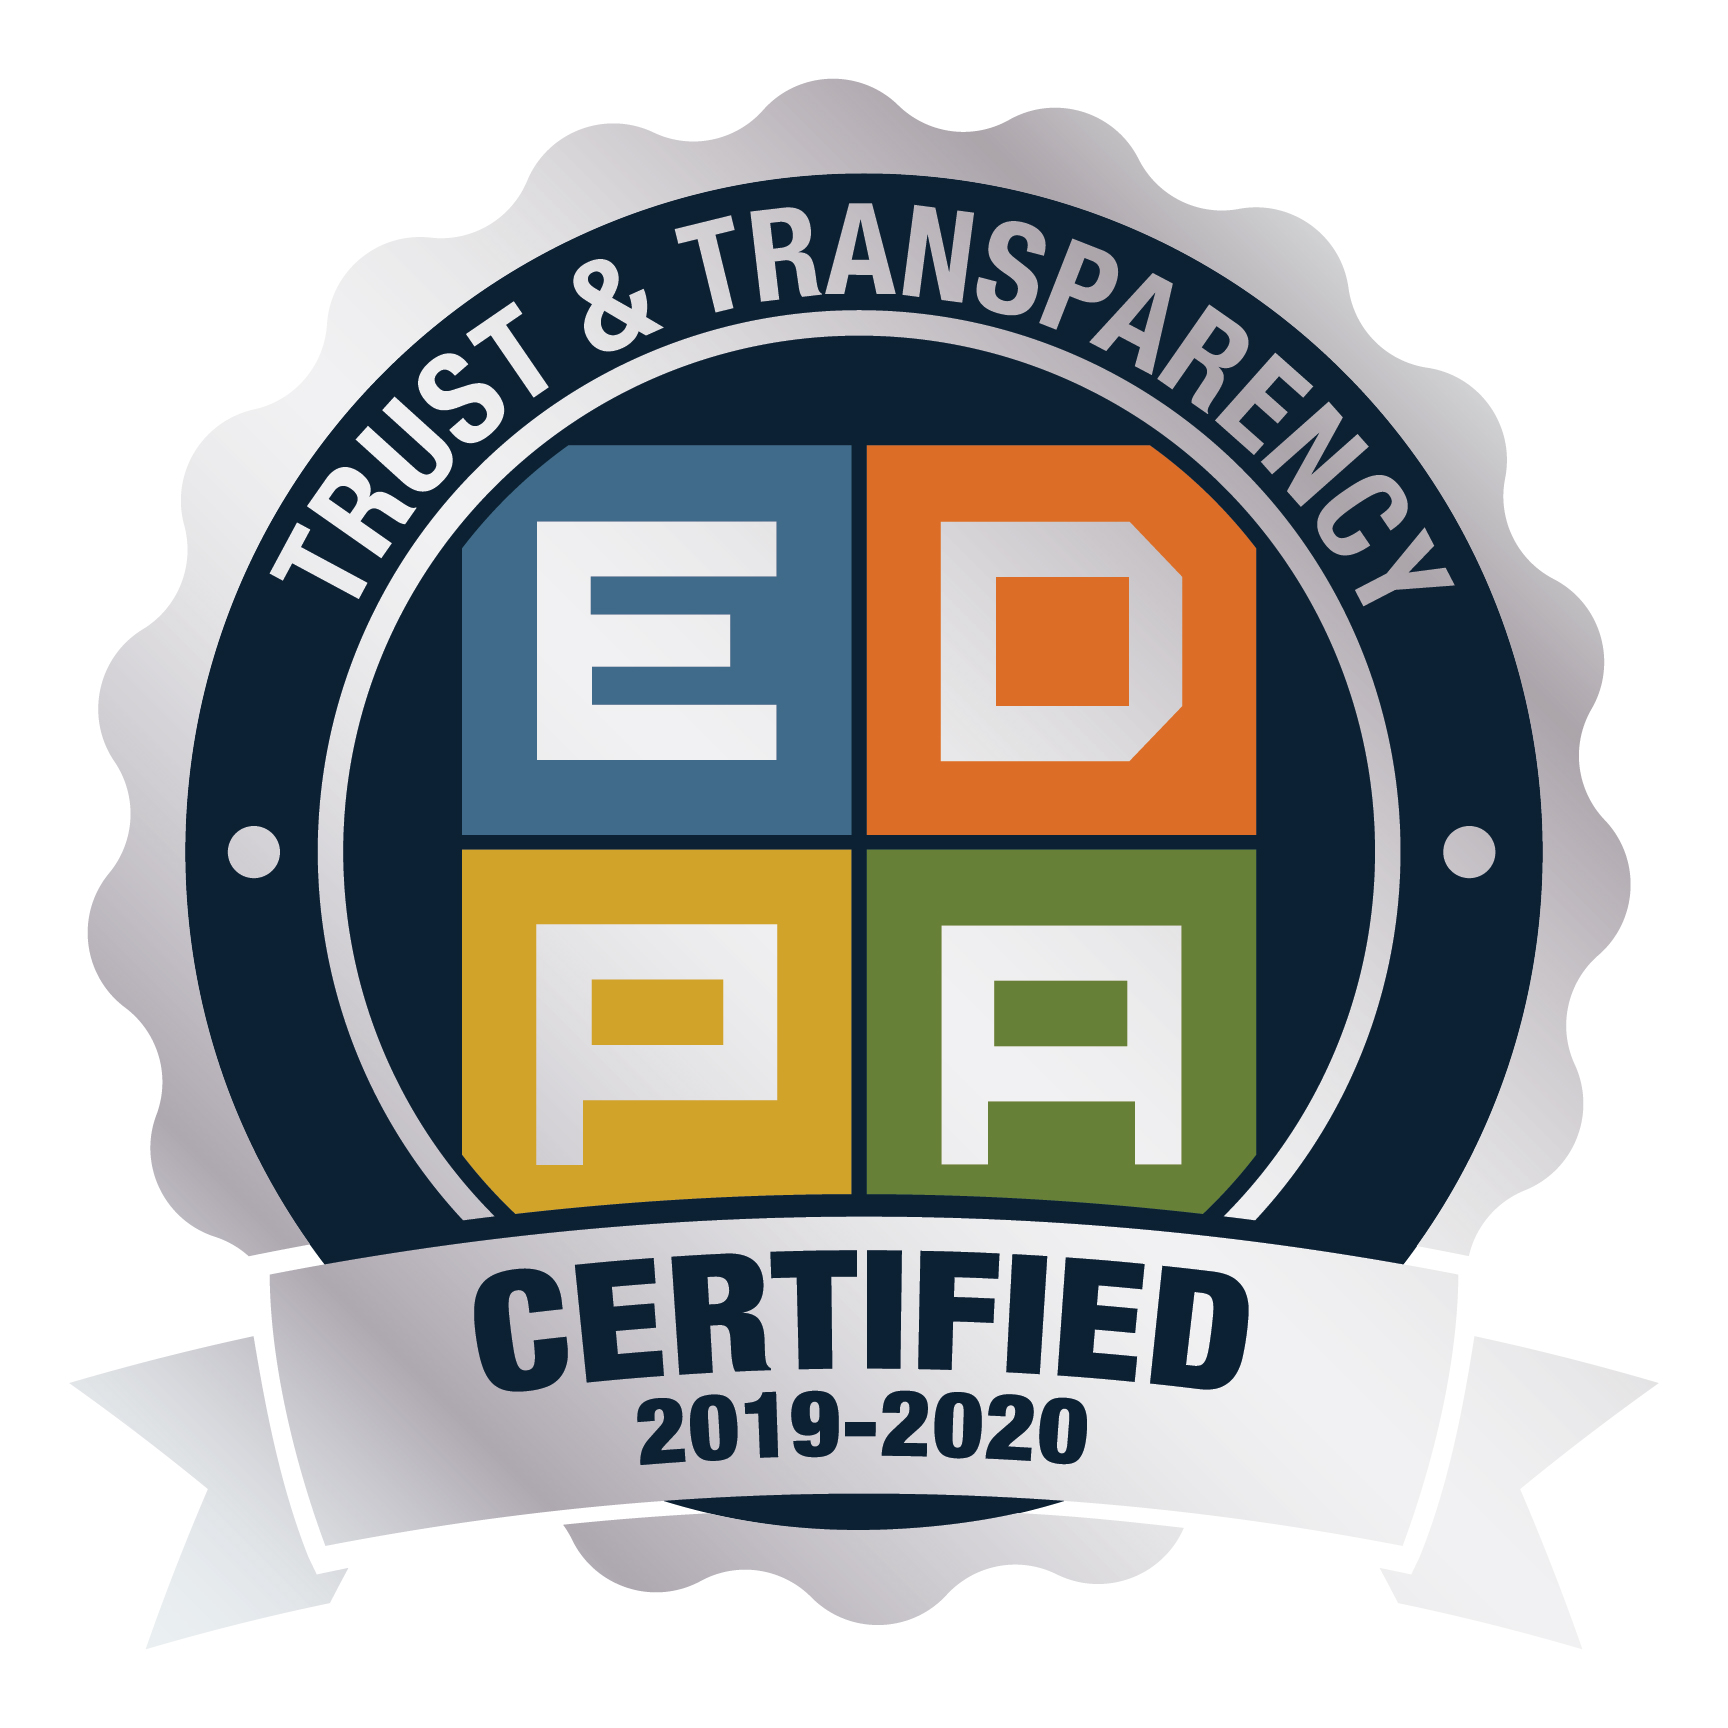 EDPA-Certified-Logo-2019-2020-Final-Full-Color.jpg